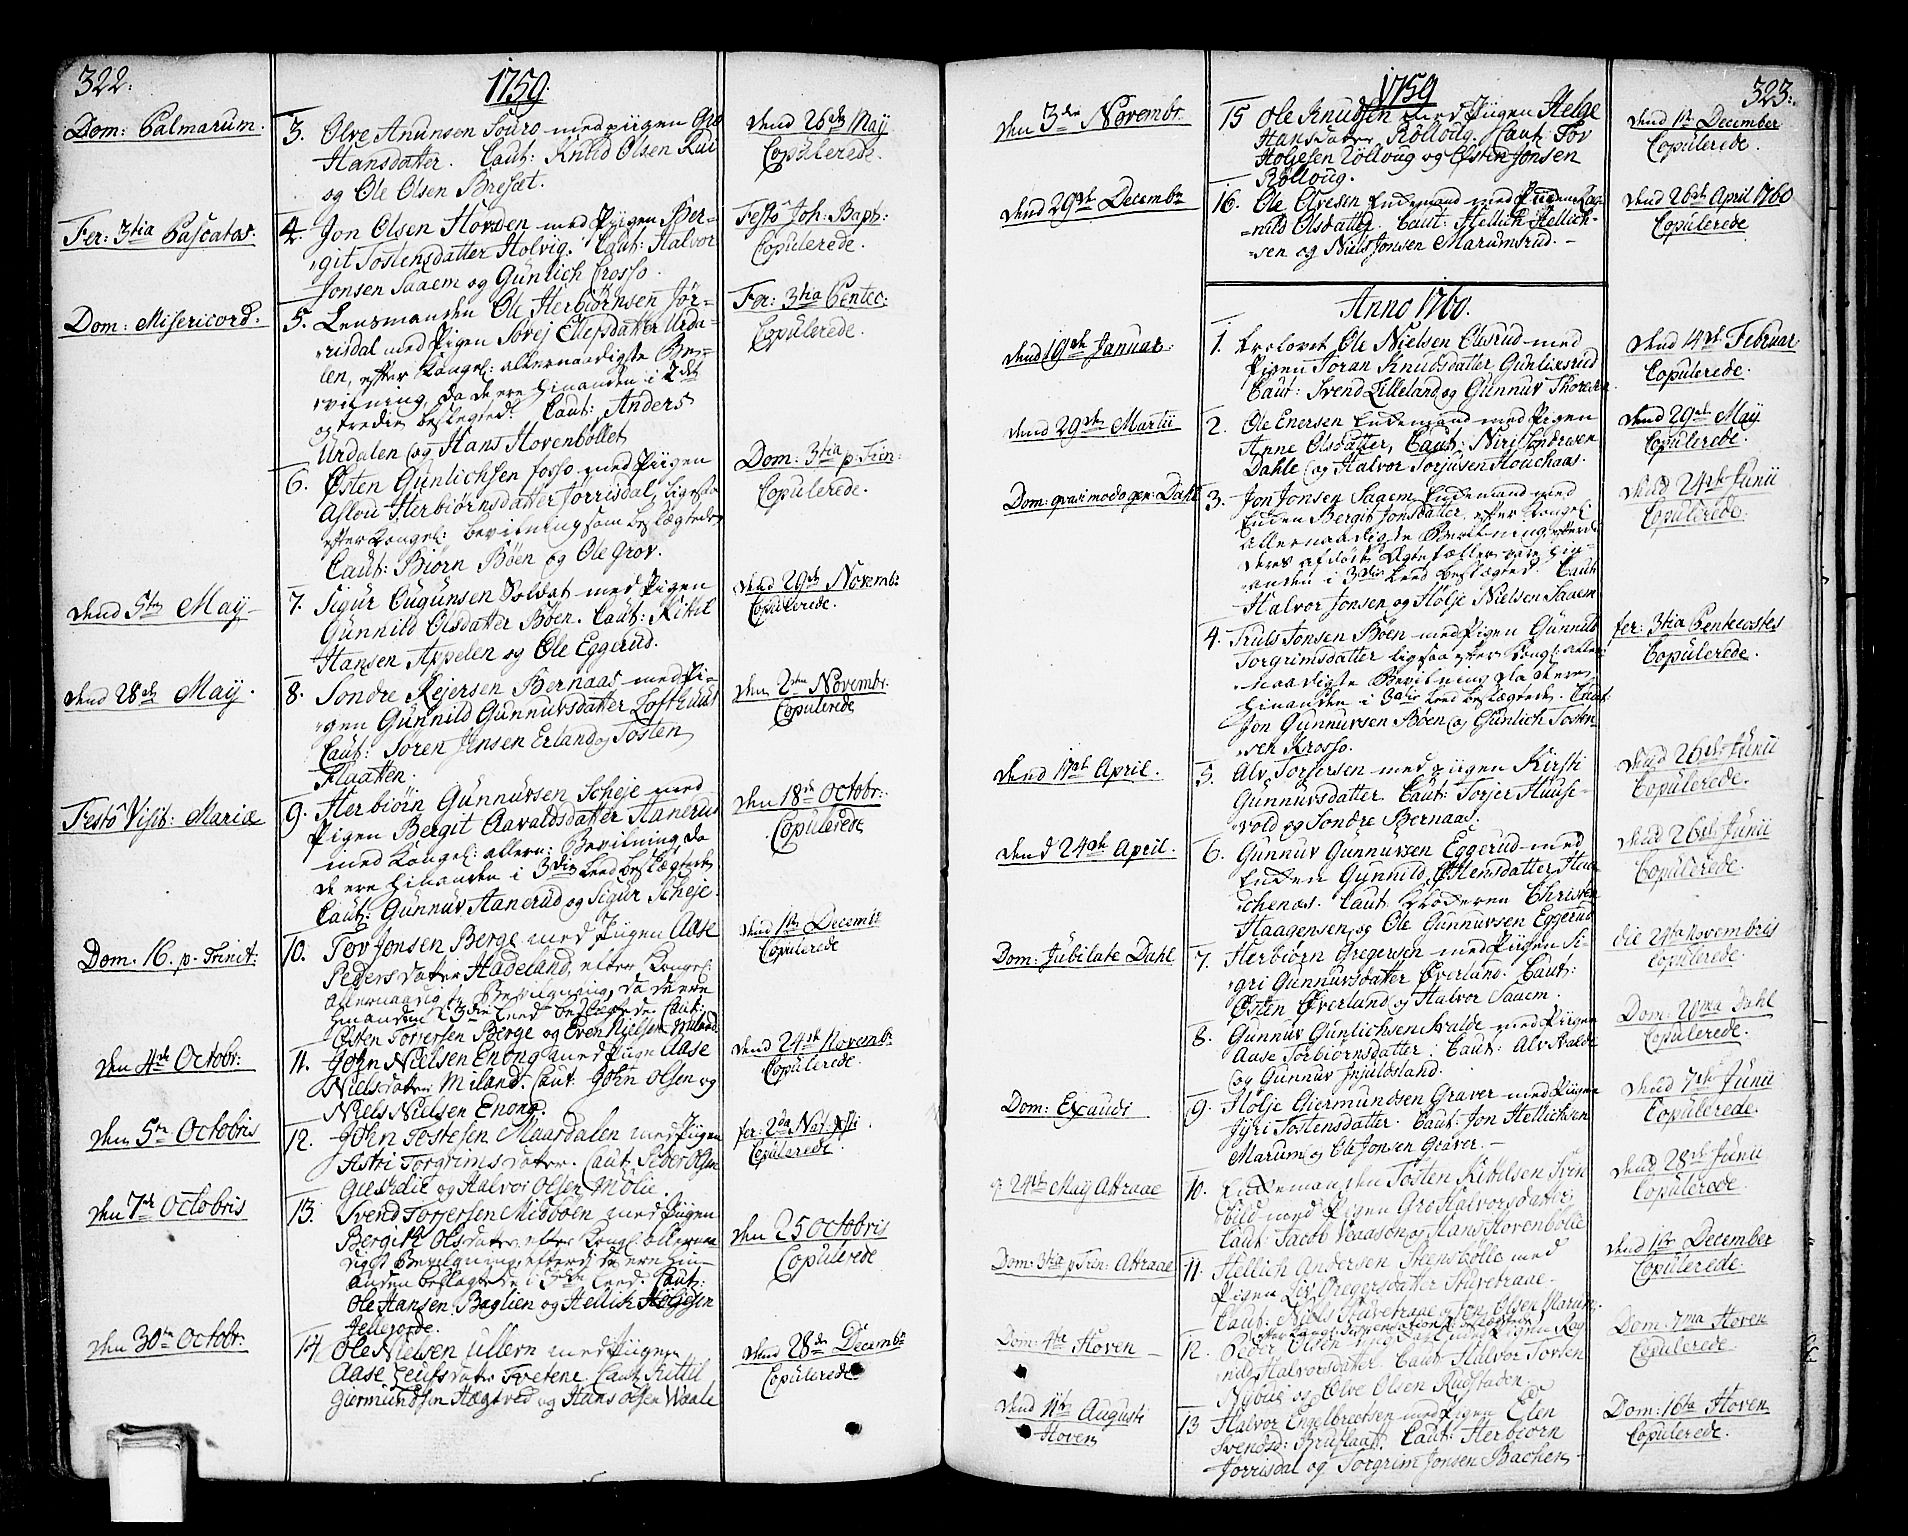 SAKO, Tinn kirkebøker, F/Fa/L0002: Ministerialbok nr. I 2, 1757-1810, s. 322-323